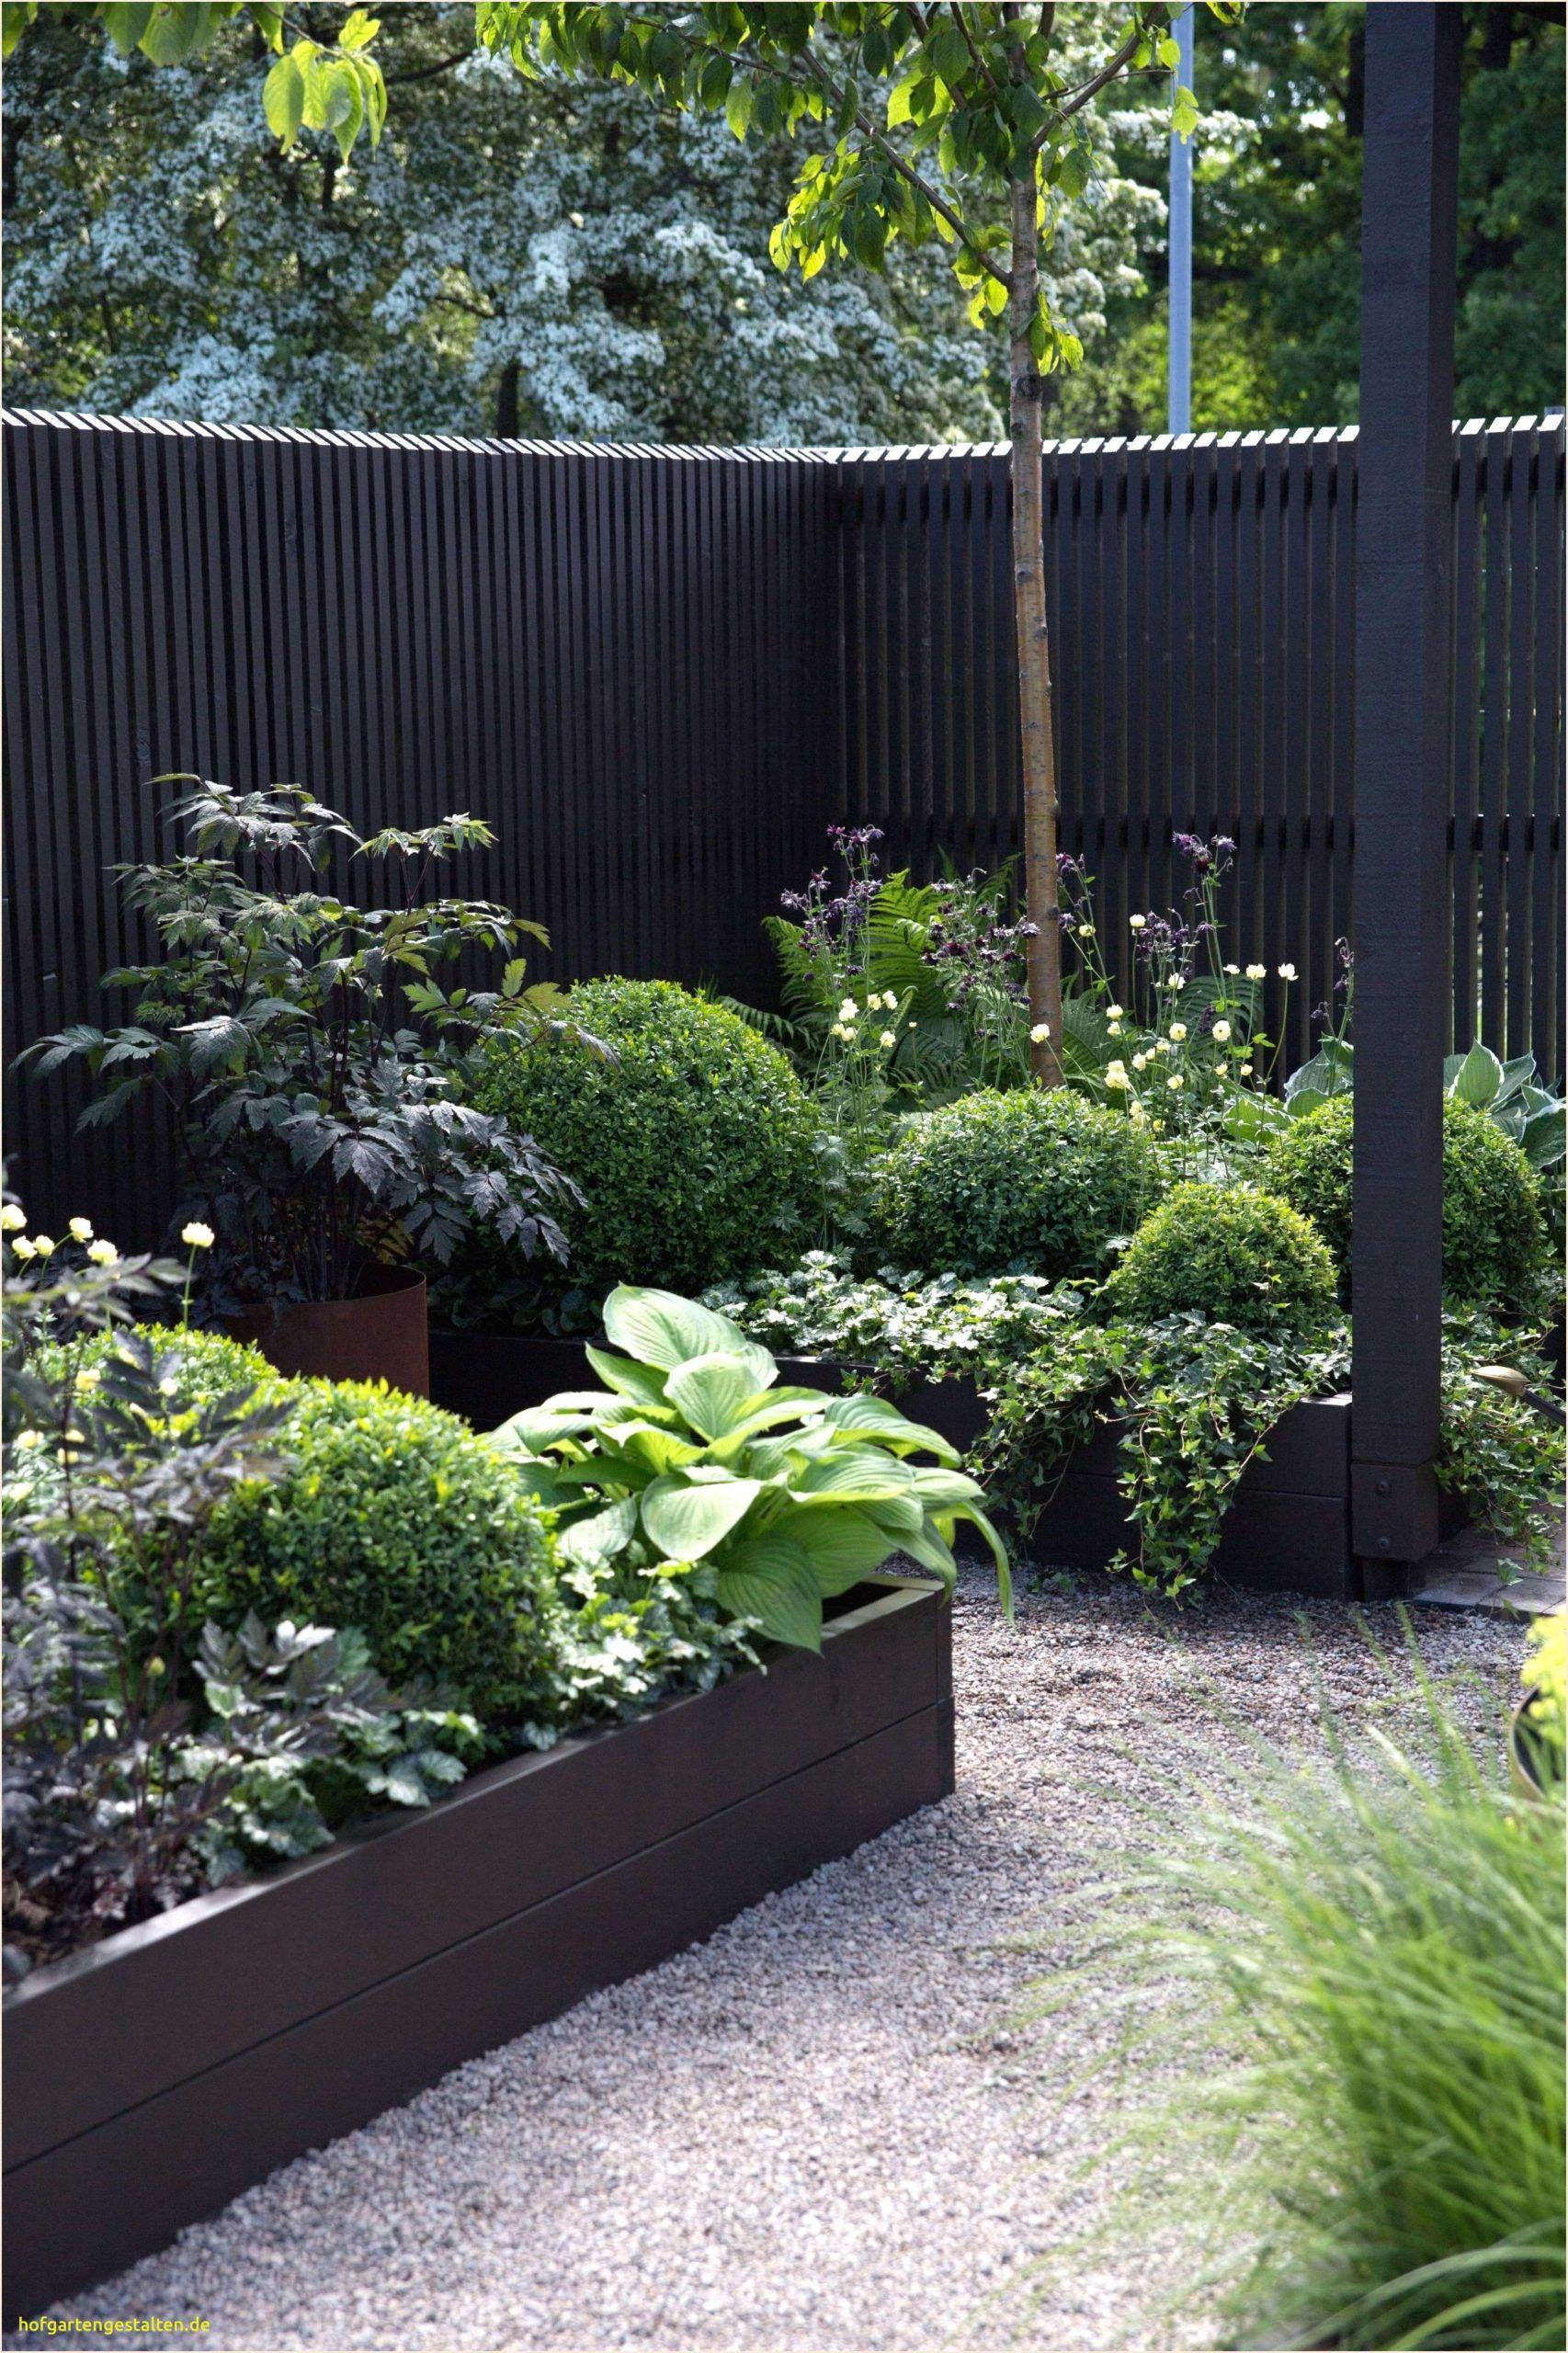 Garten Arbeiten Einzigartig Alten Garten Neu Anlegen — Temobardz Home Blog